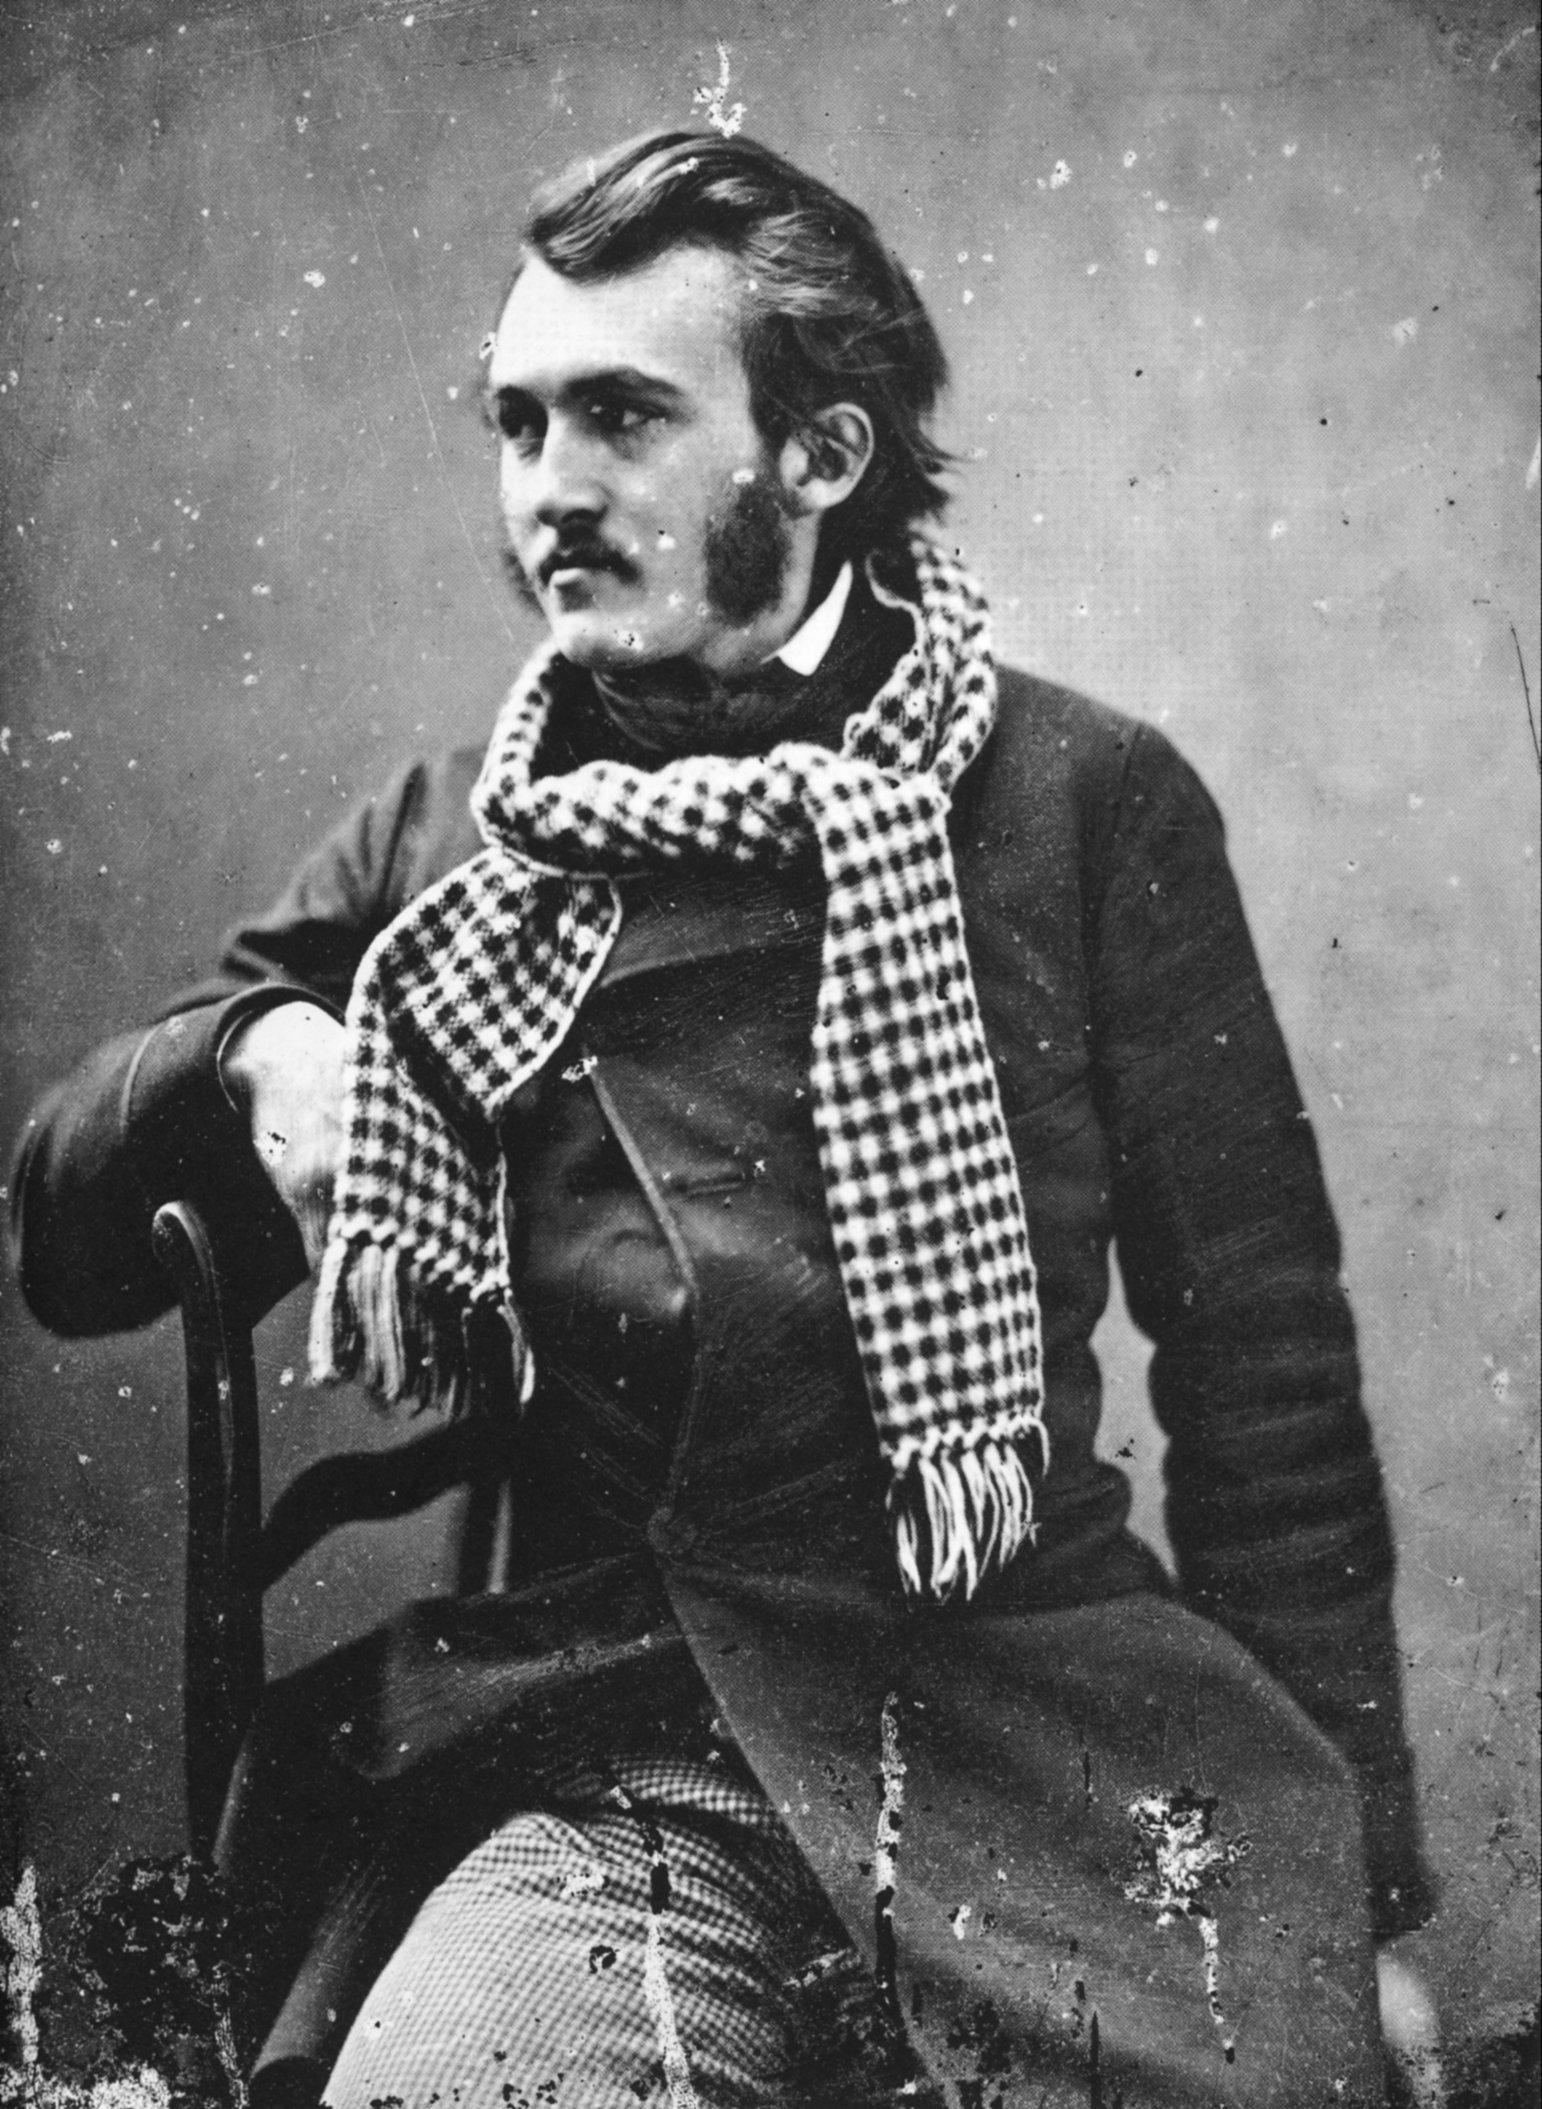 Félix_Nadar_1820-1910_portraits_Gustave_Doré.jpg